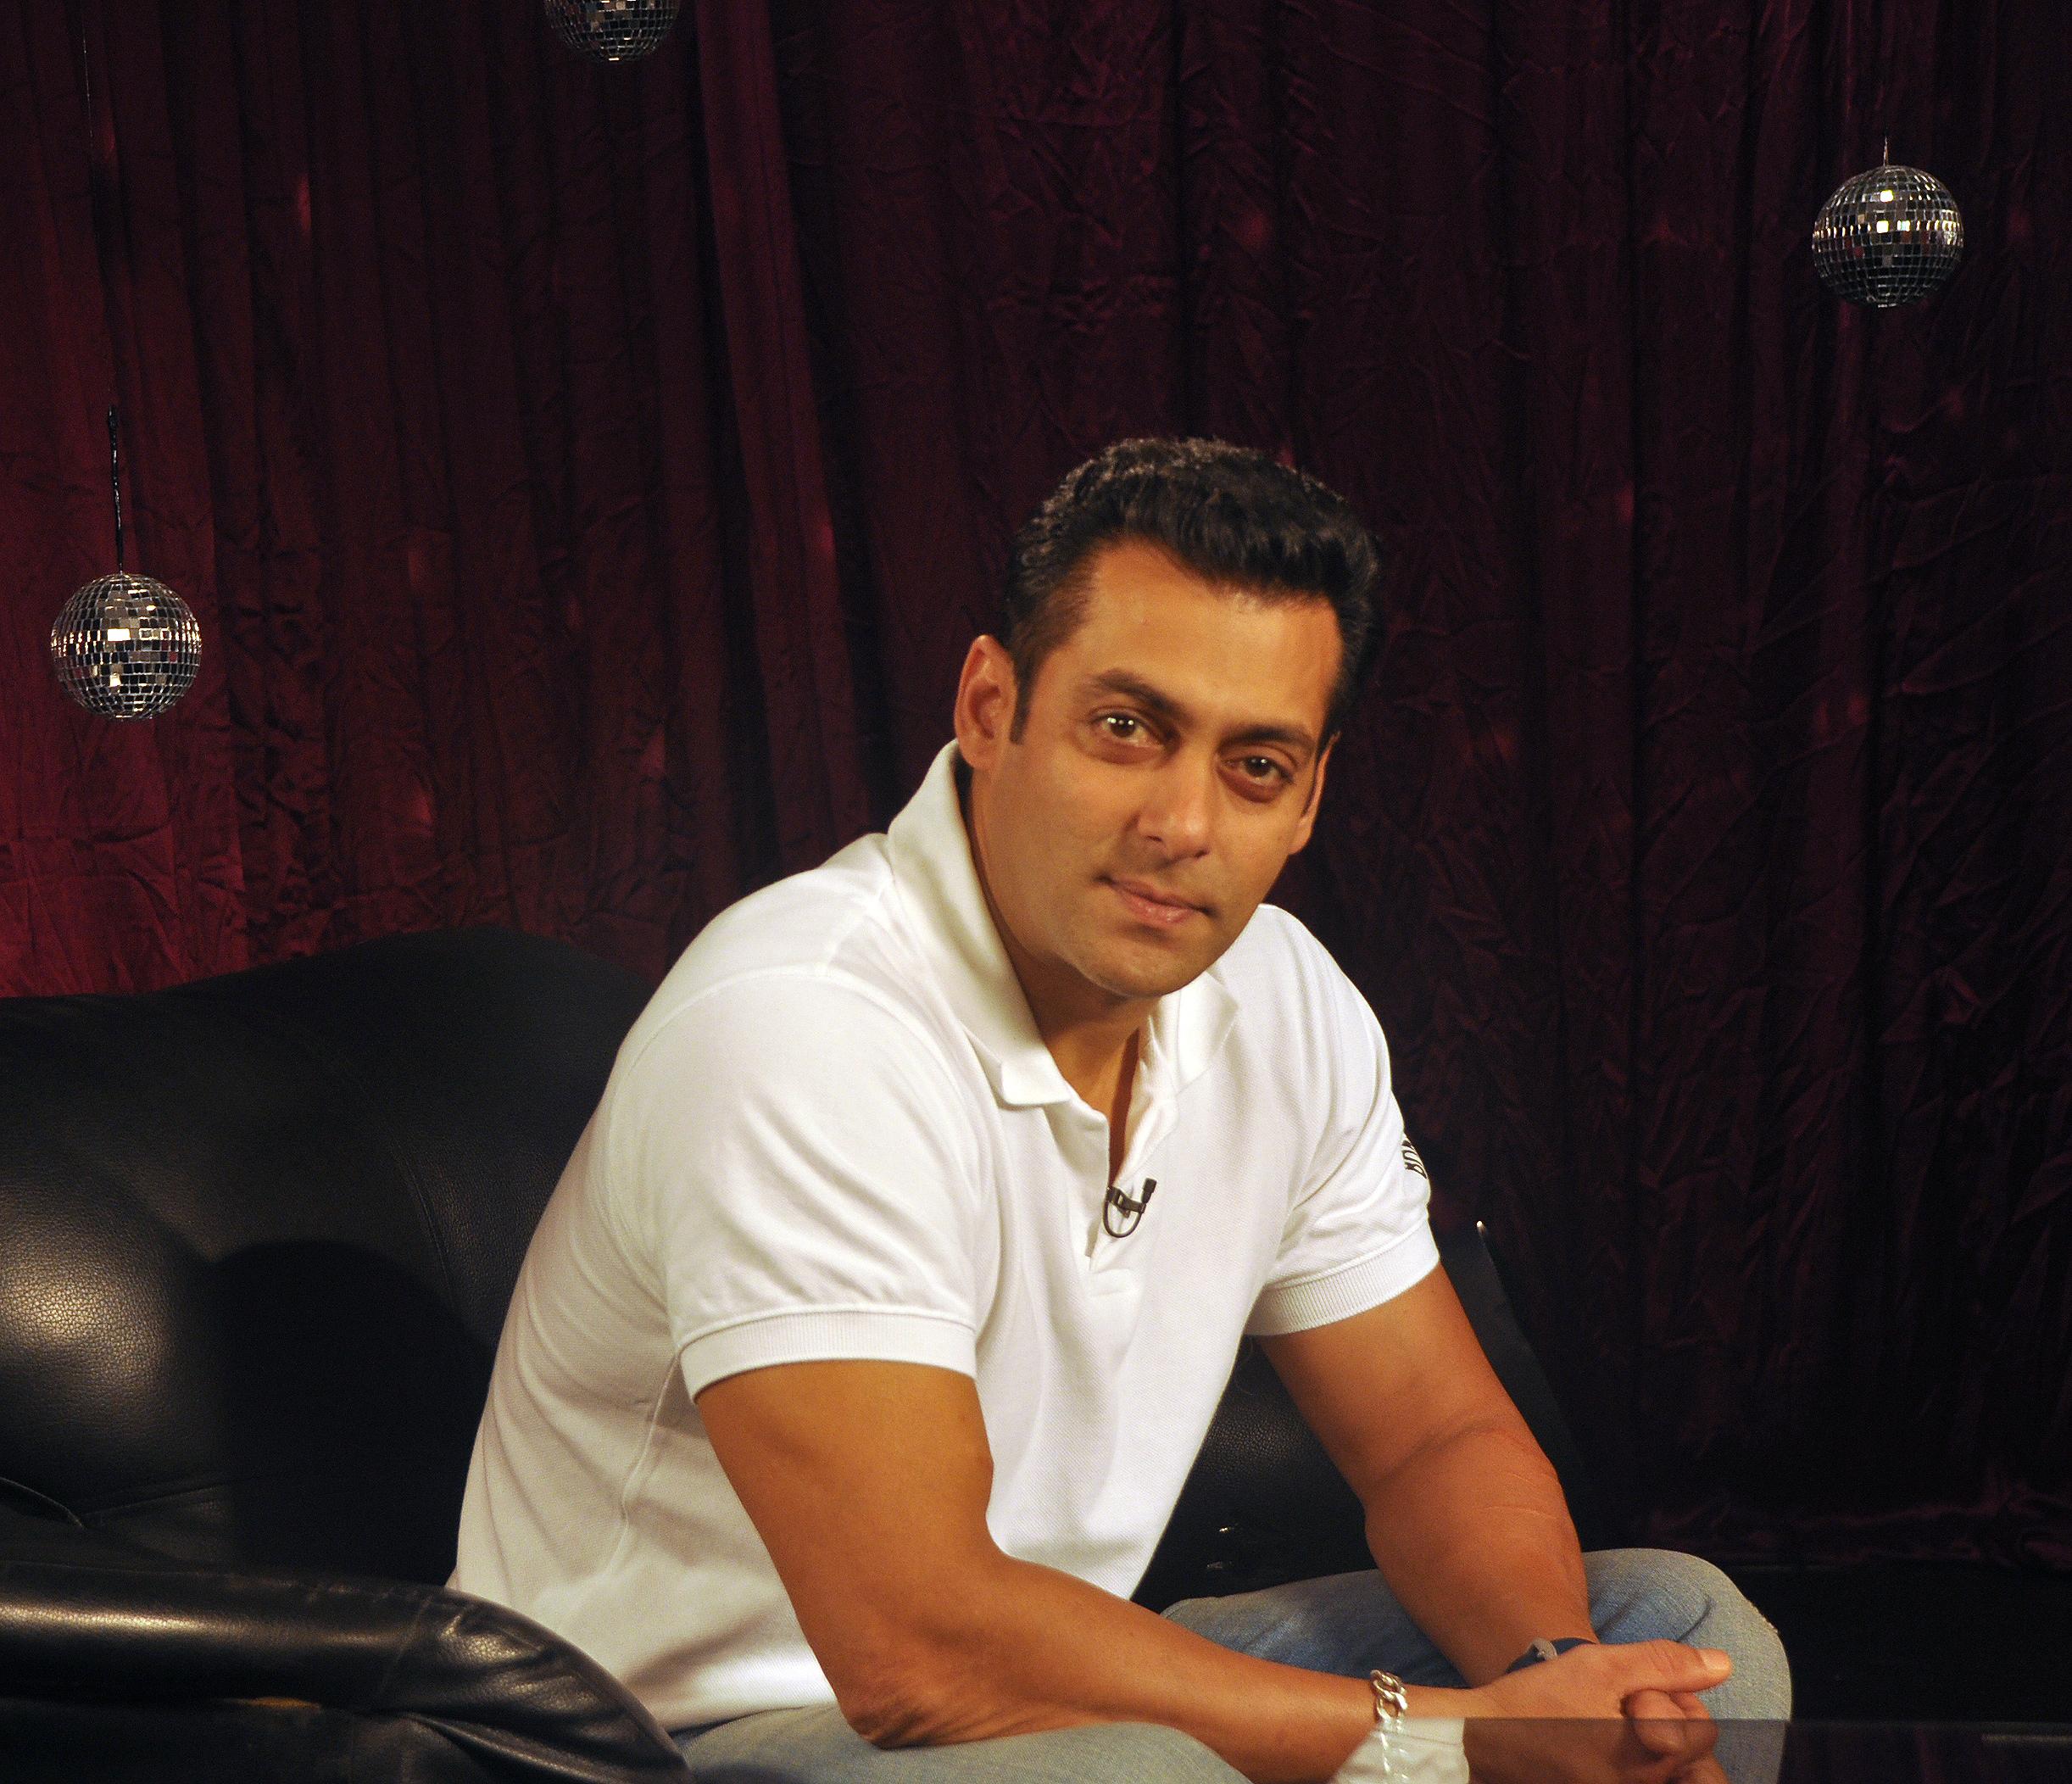 One-and-only-Salman-Khan-salmankhan-zoomtv-bollywood-wallpaper-wp4809213